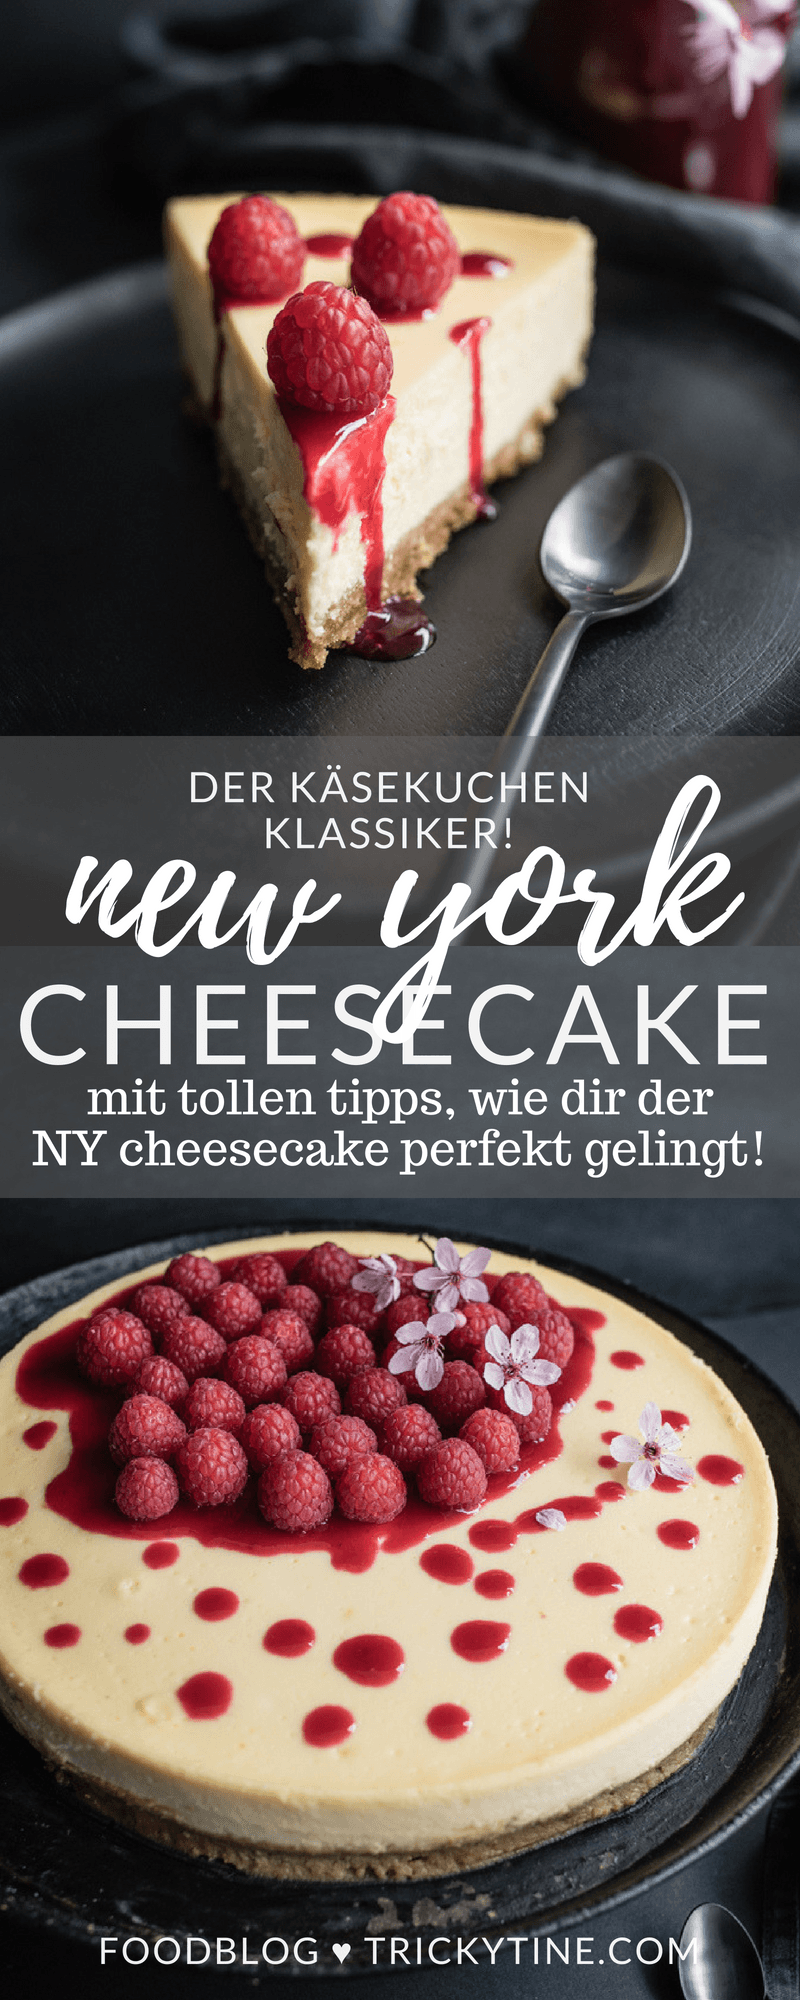 NY Cheesecake trickytine pinterest